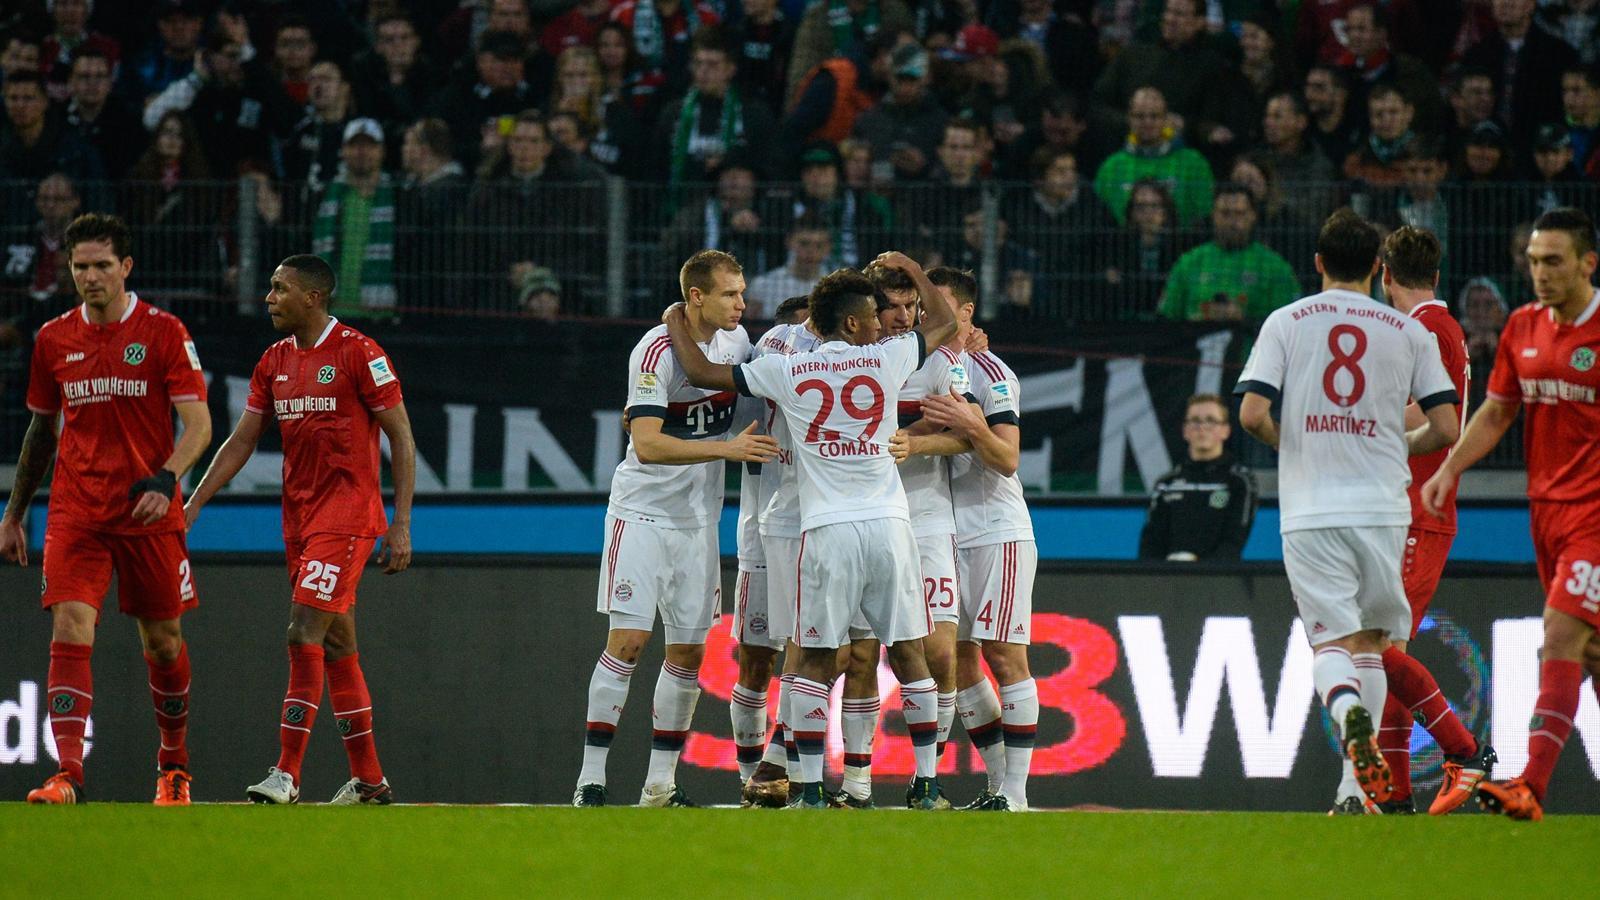 Thomas Müller, FC Bayern Munich